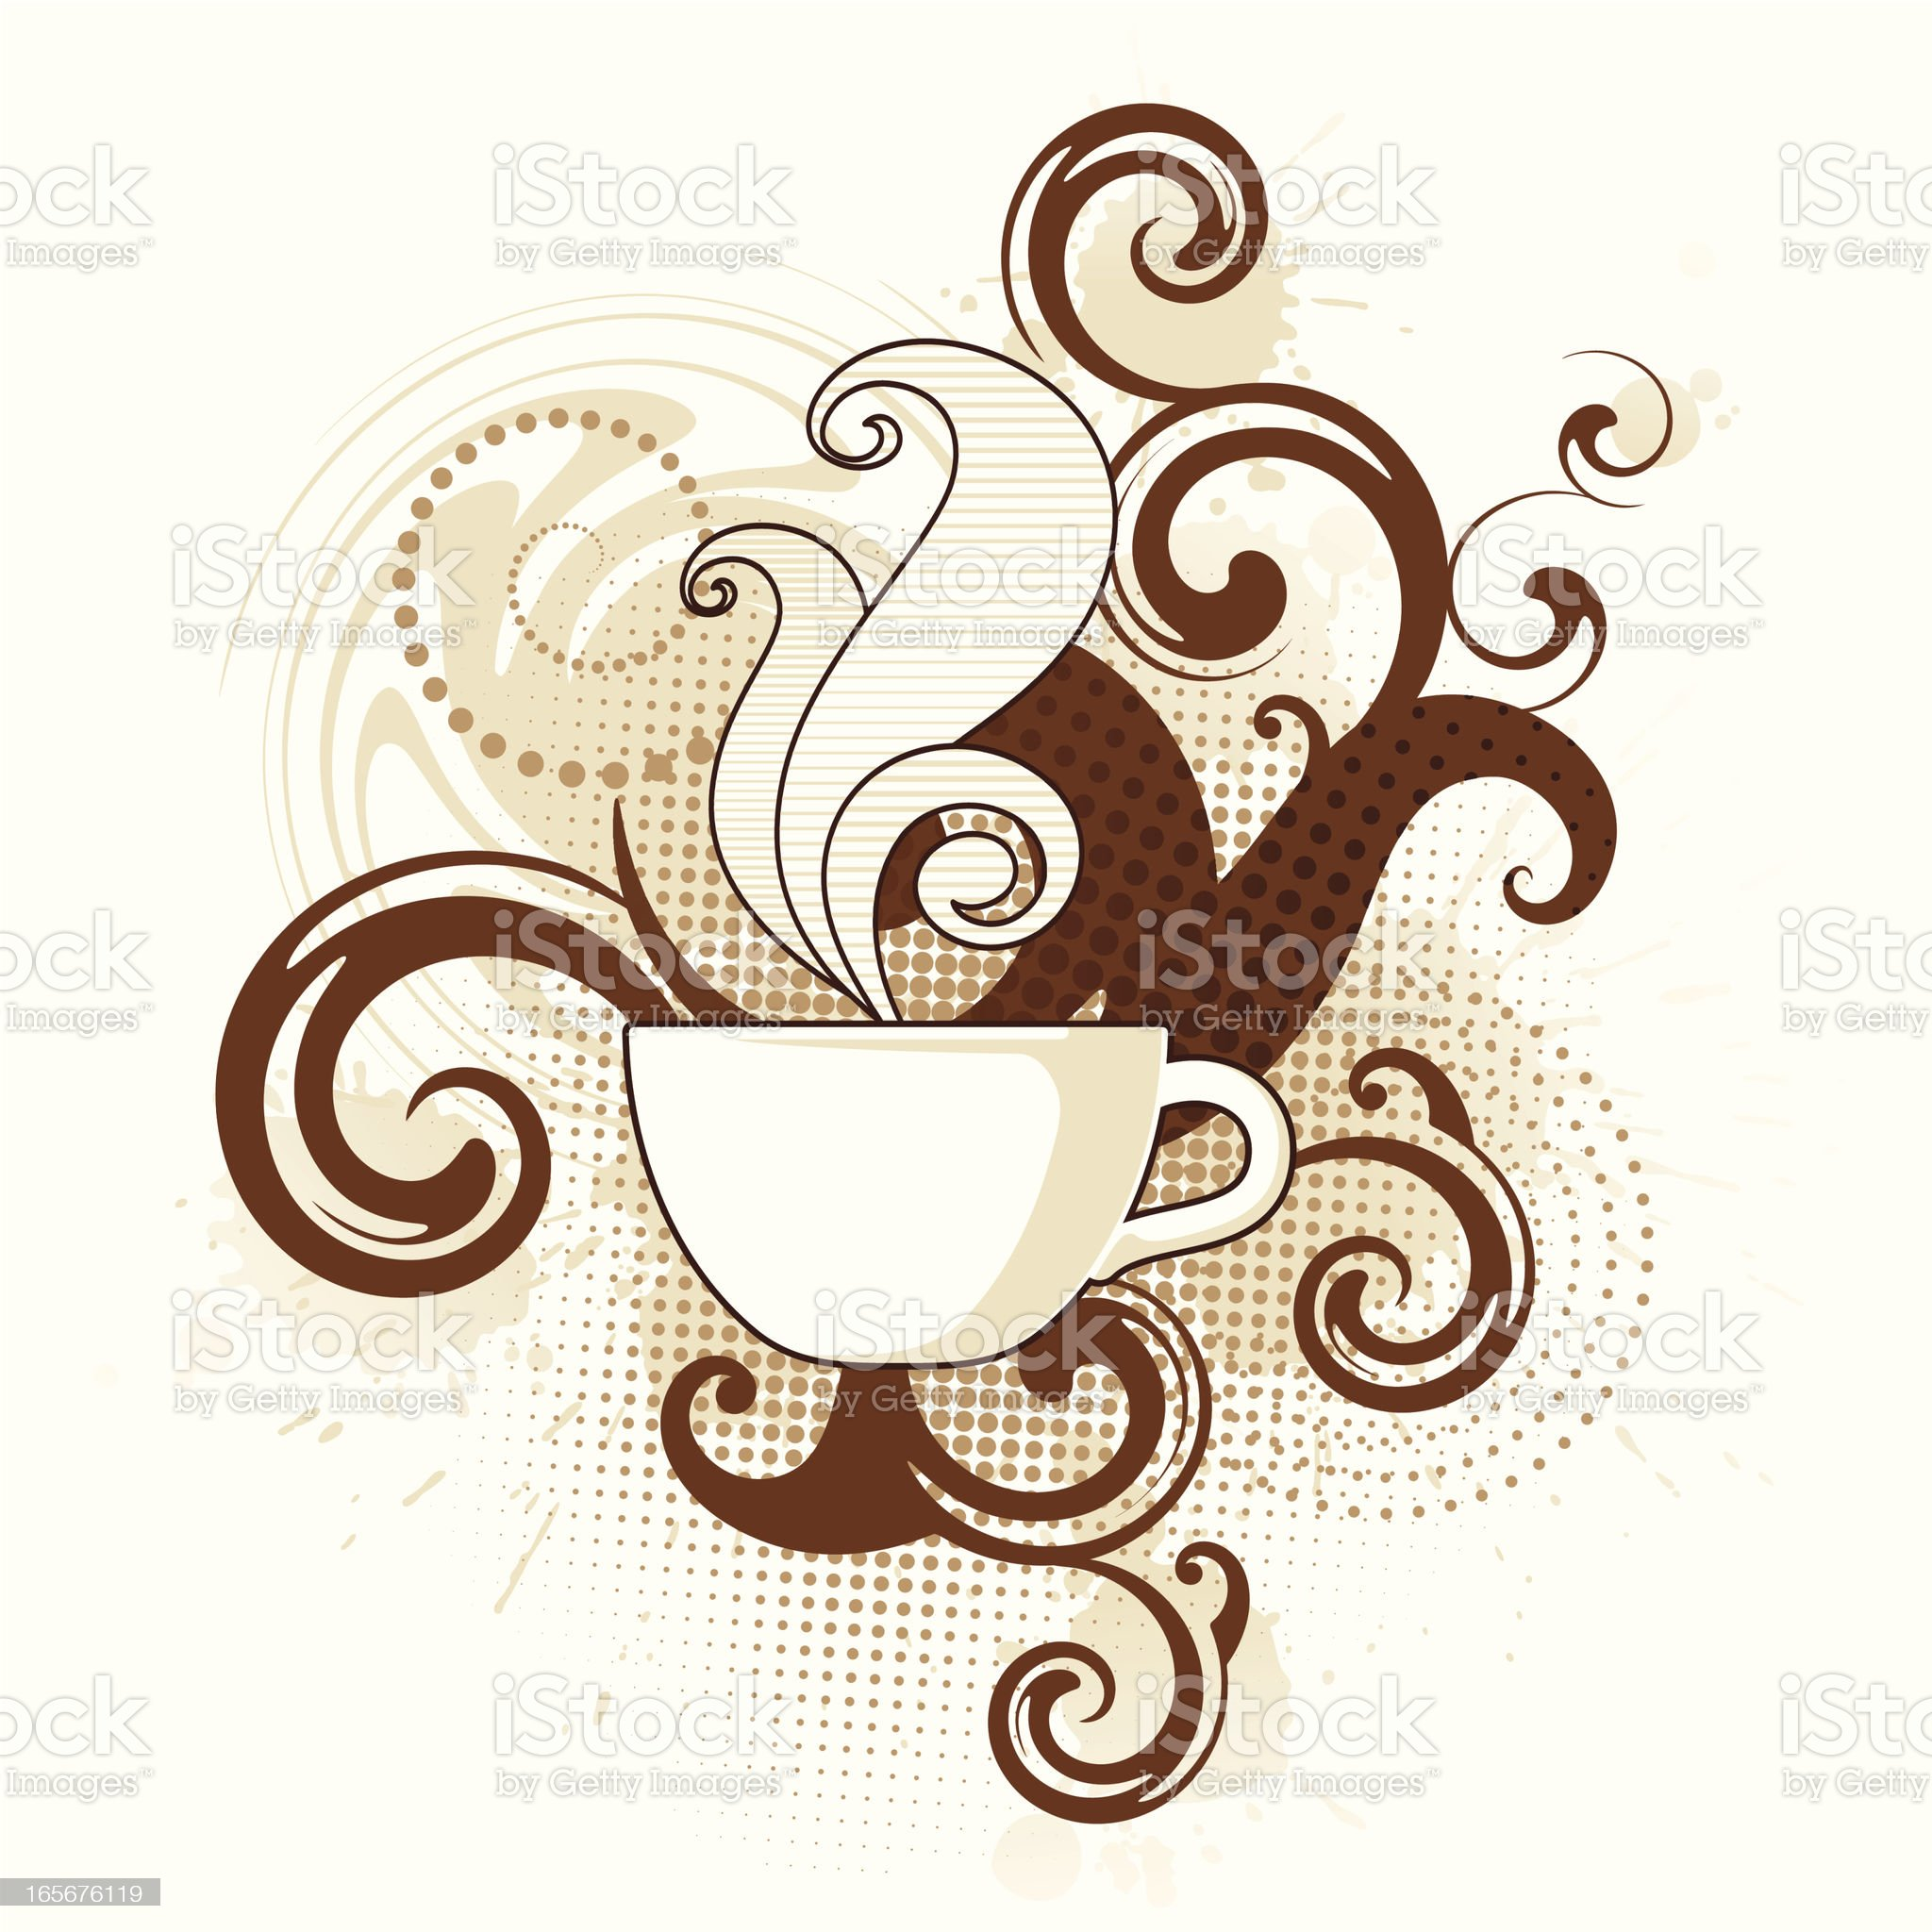 Coffee Swirls royalty-free stock vector art